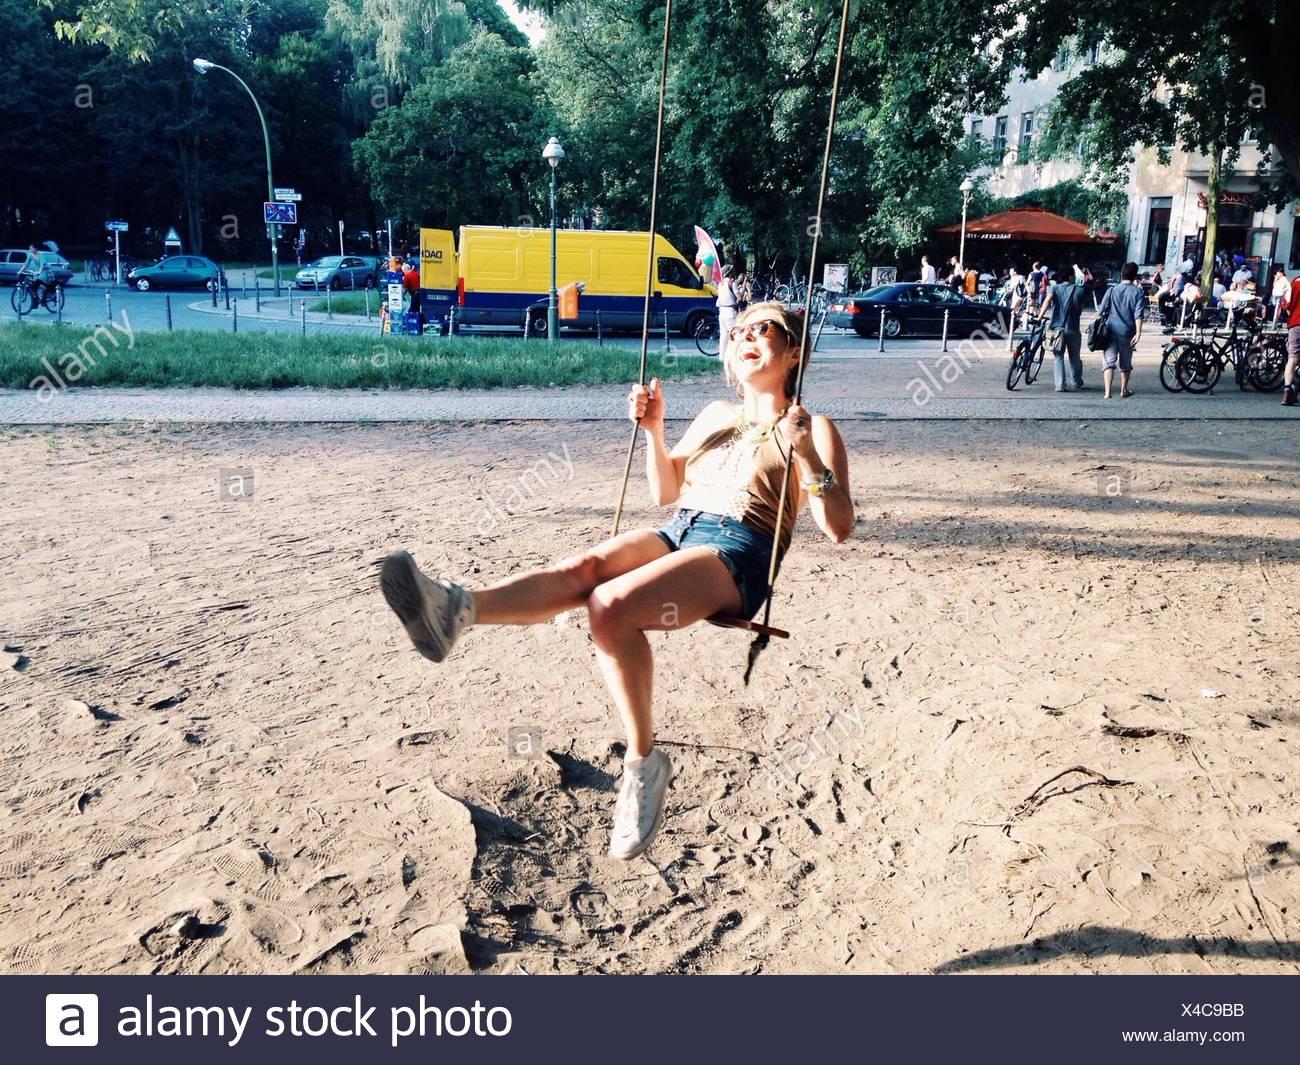 Toute la longueur d'un cute girl Sitting on Swing Photo Stock